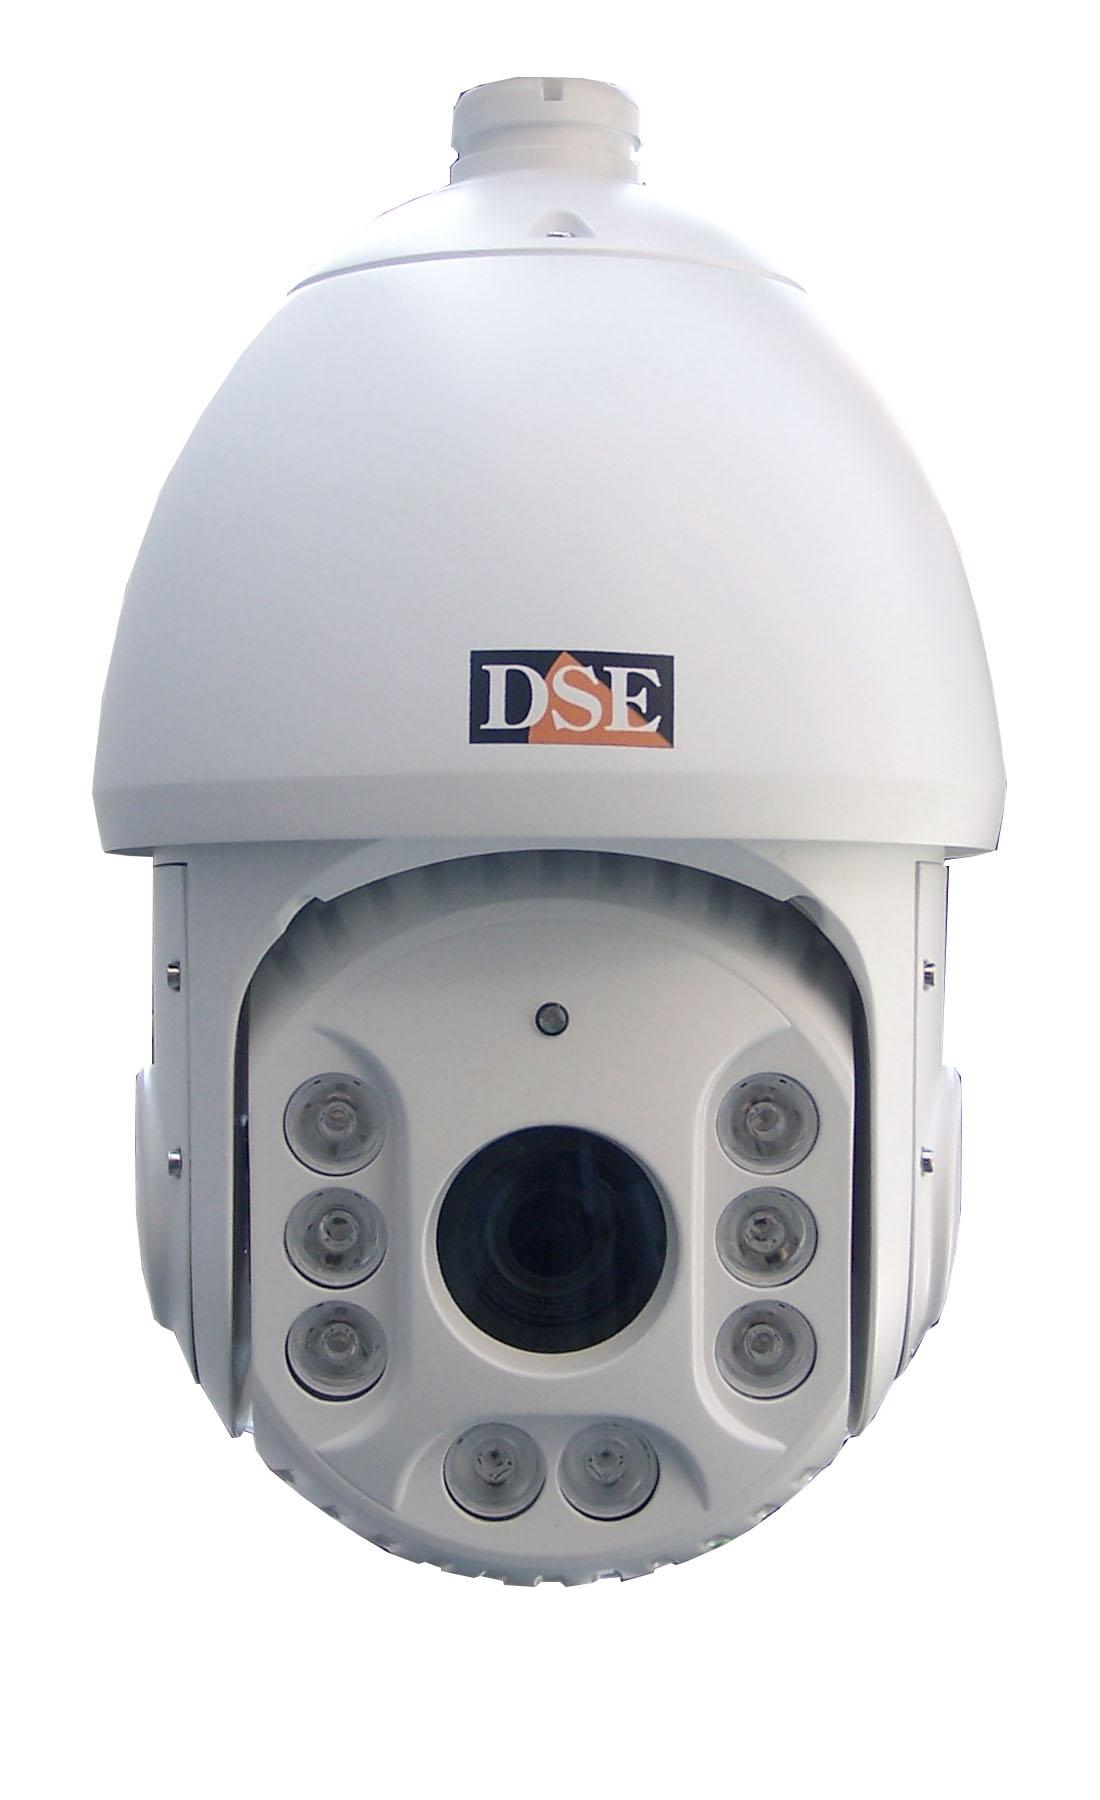 onvif ip speed dome cameras ptz network cameras outdoor speed dome cameras motorized ip dome. Black Bedroom Furniture Sets. Home Design Ideas